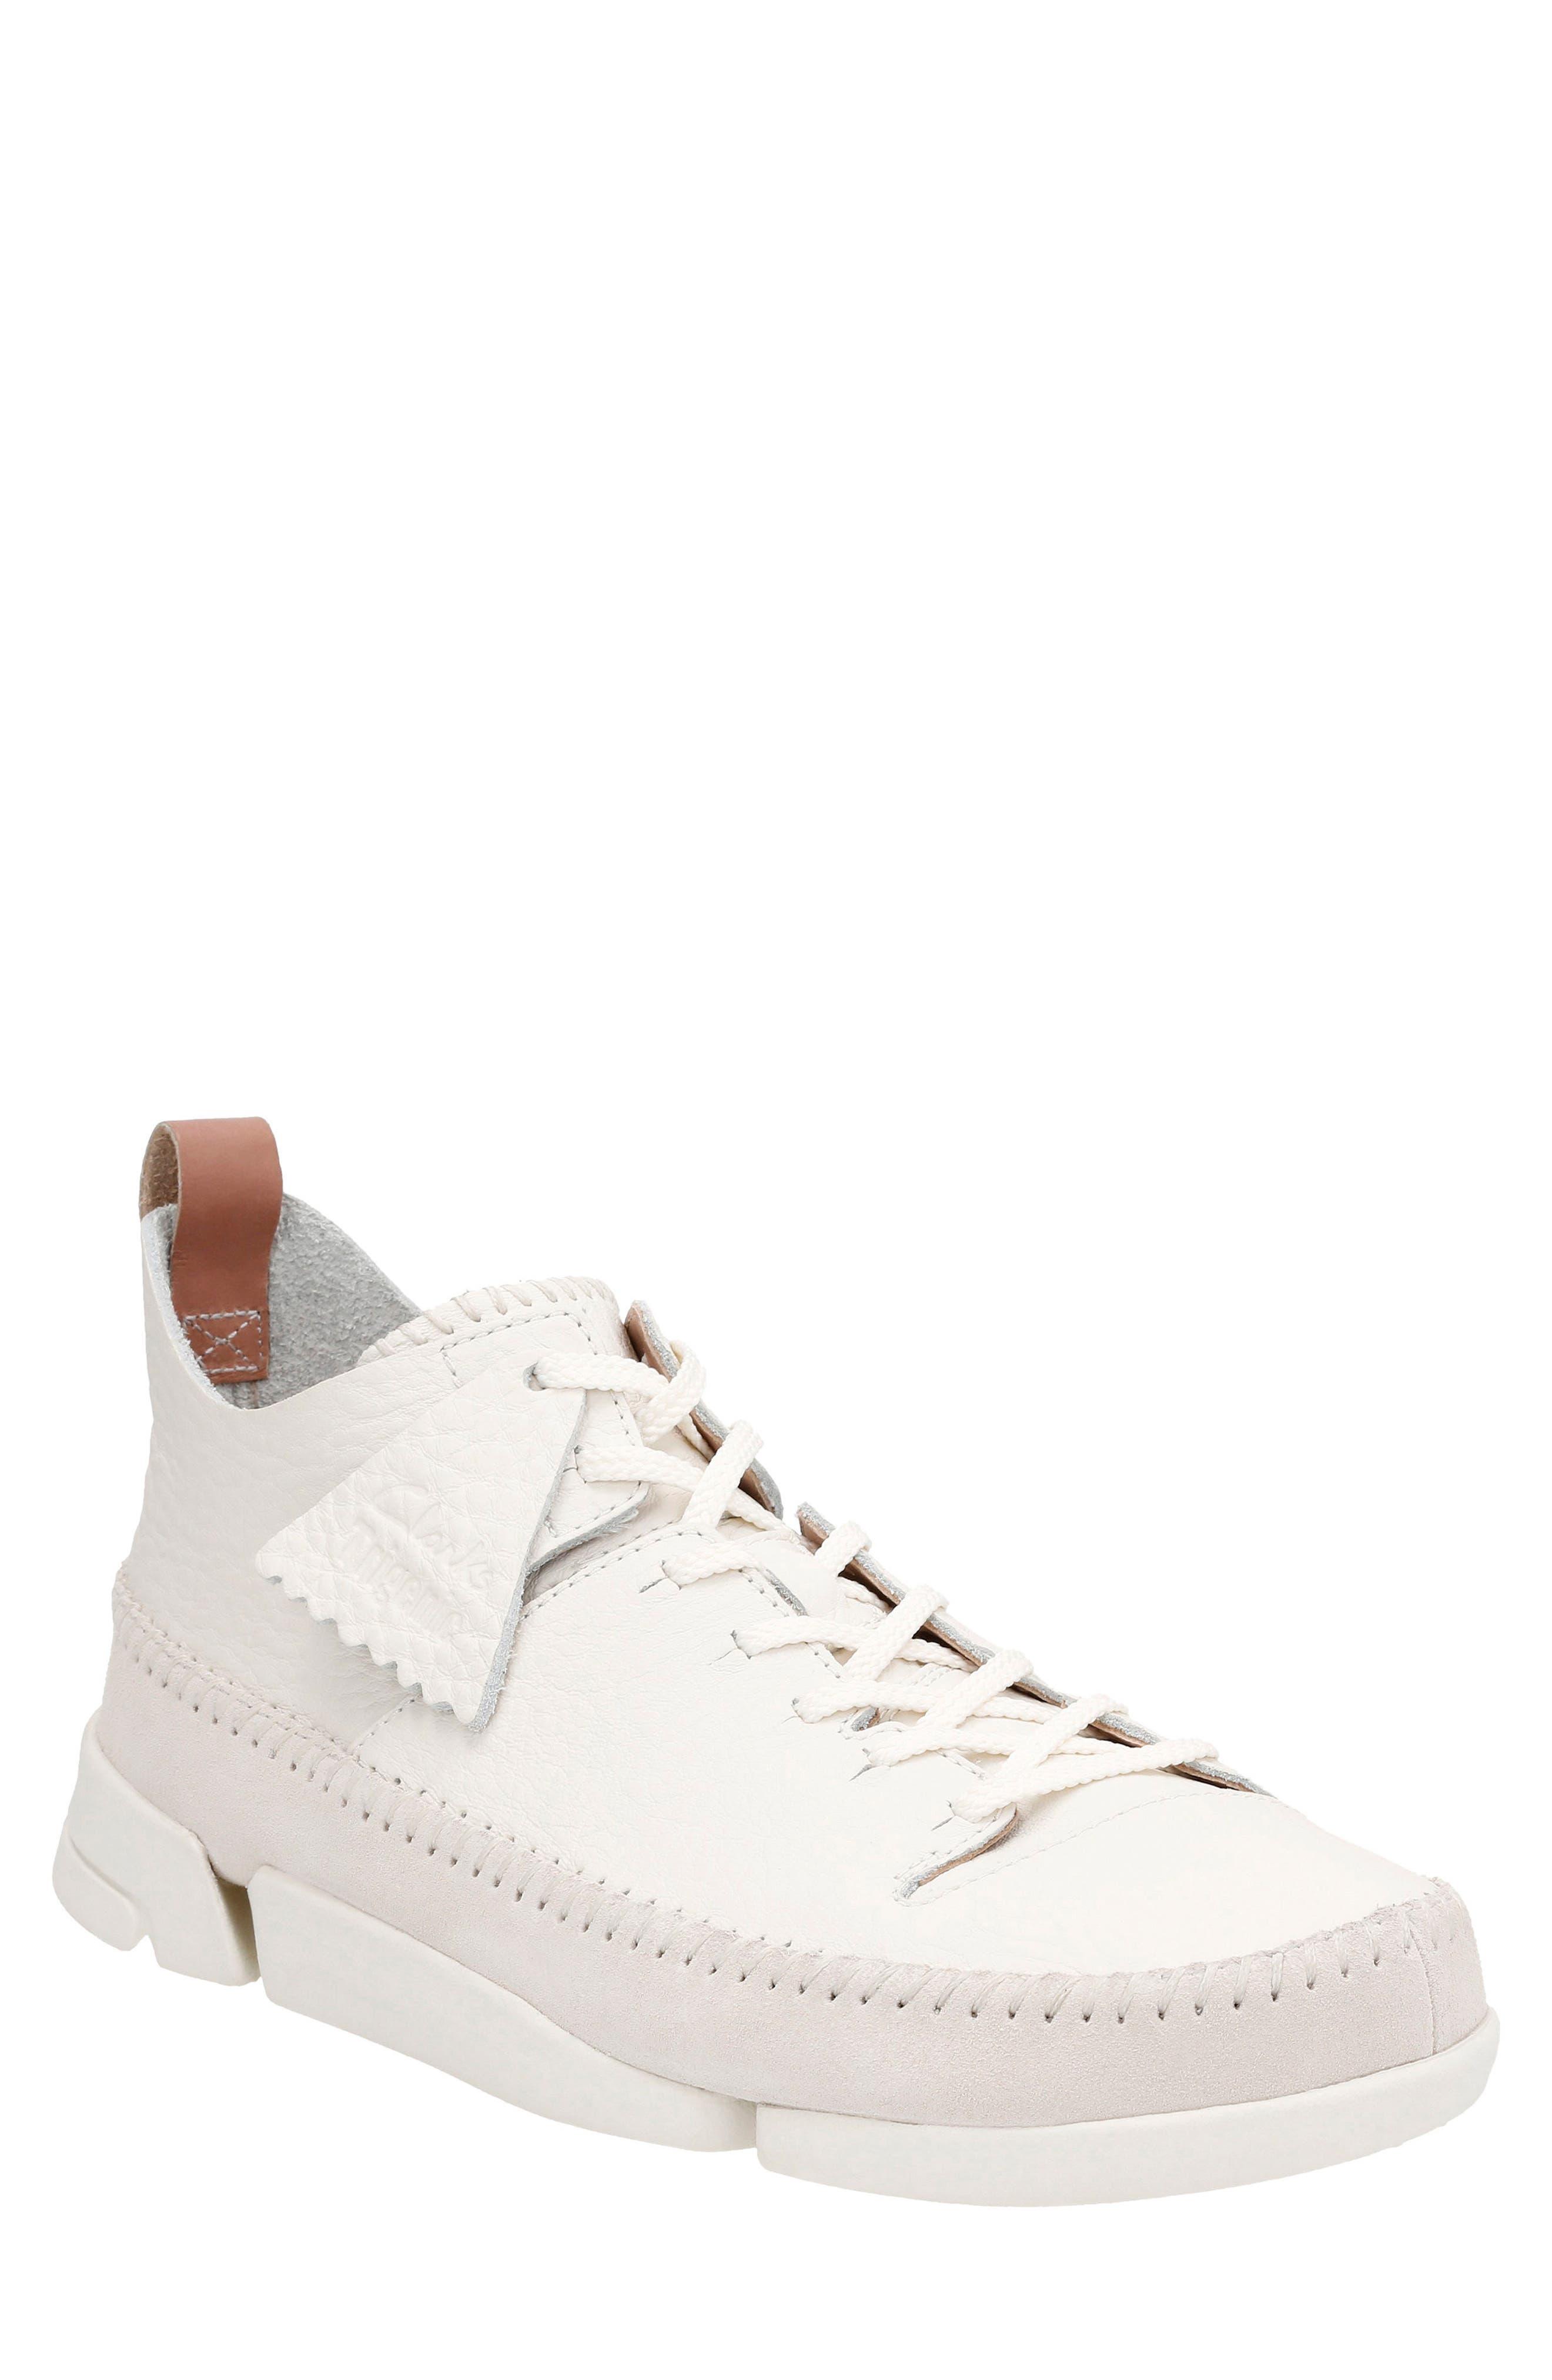 Main Image - Clarks® 'Trigenic Flex' Leather Sneaker (Men)